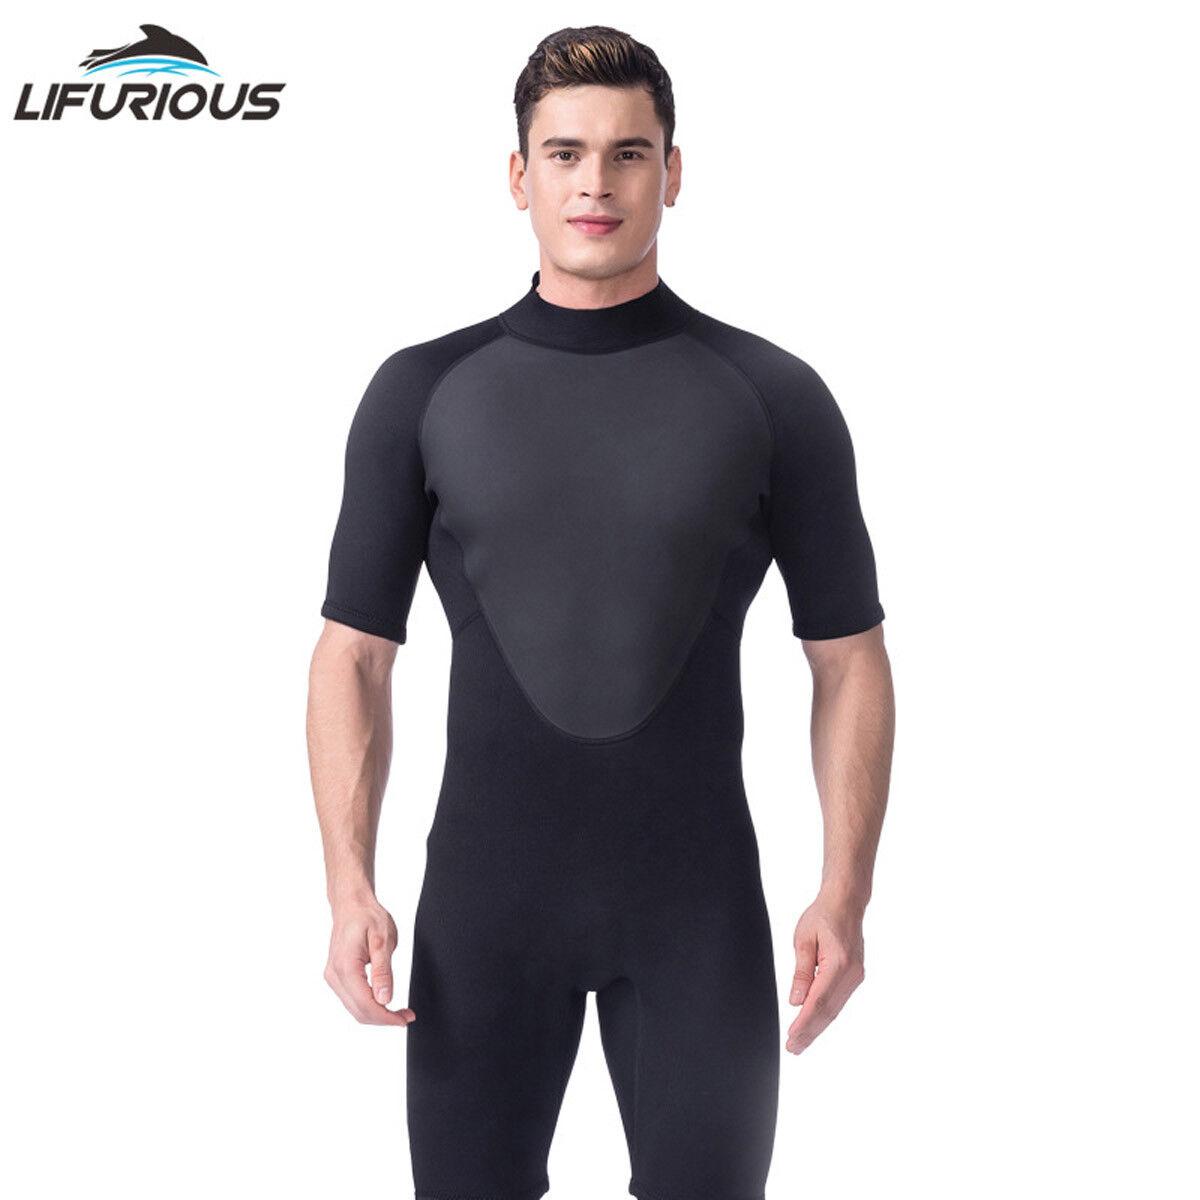 3mm Neoprene Men's Short Wetsuit Diving Swimming Surf  Split Suit Spearfishing  a lot of surprises